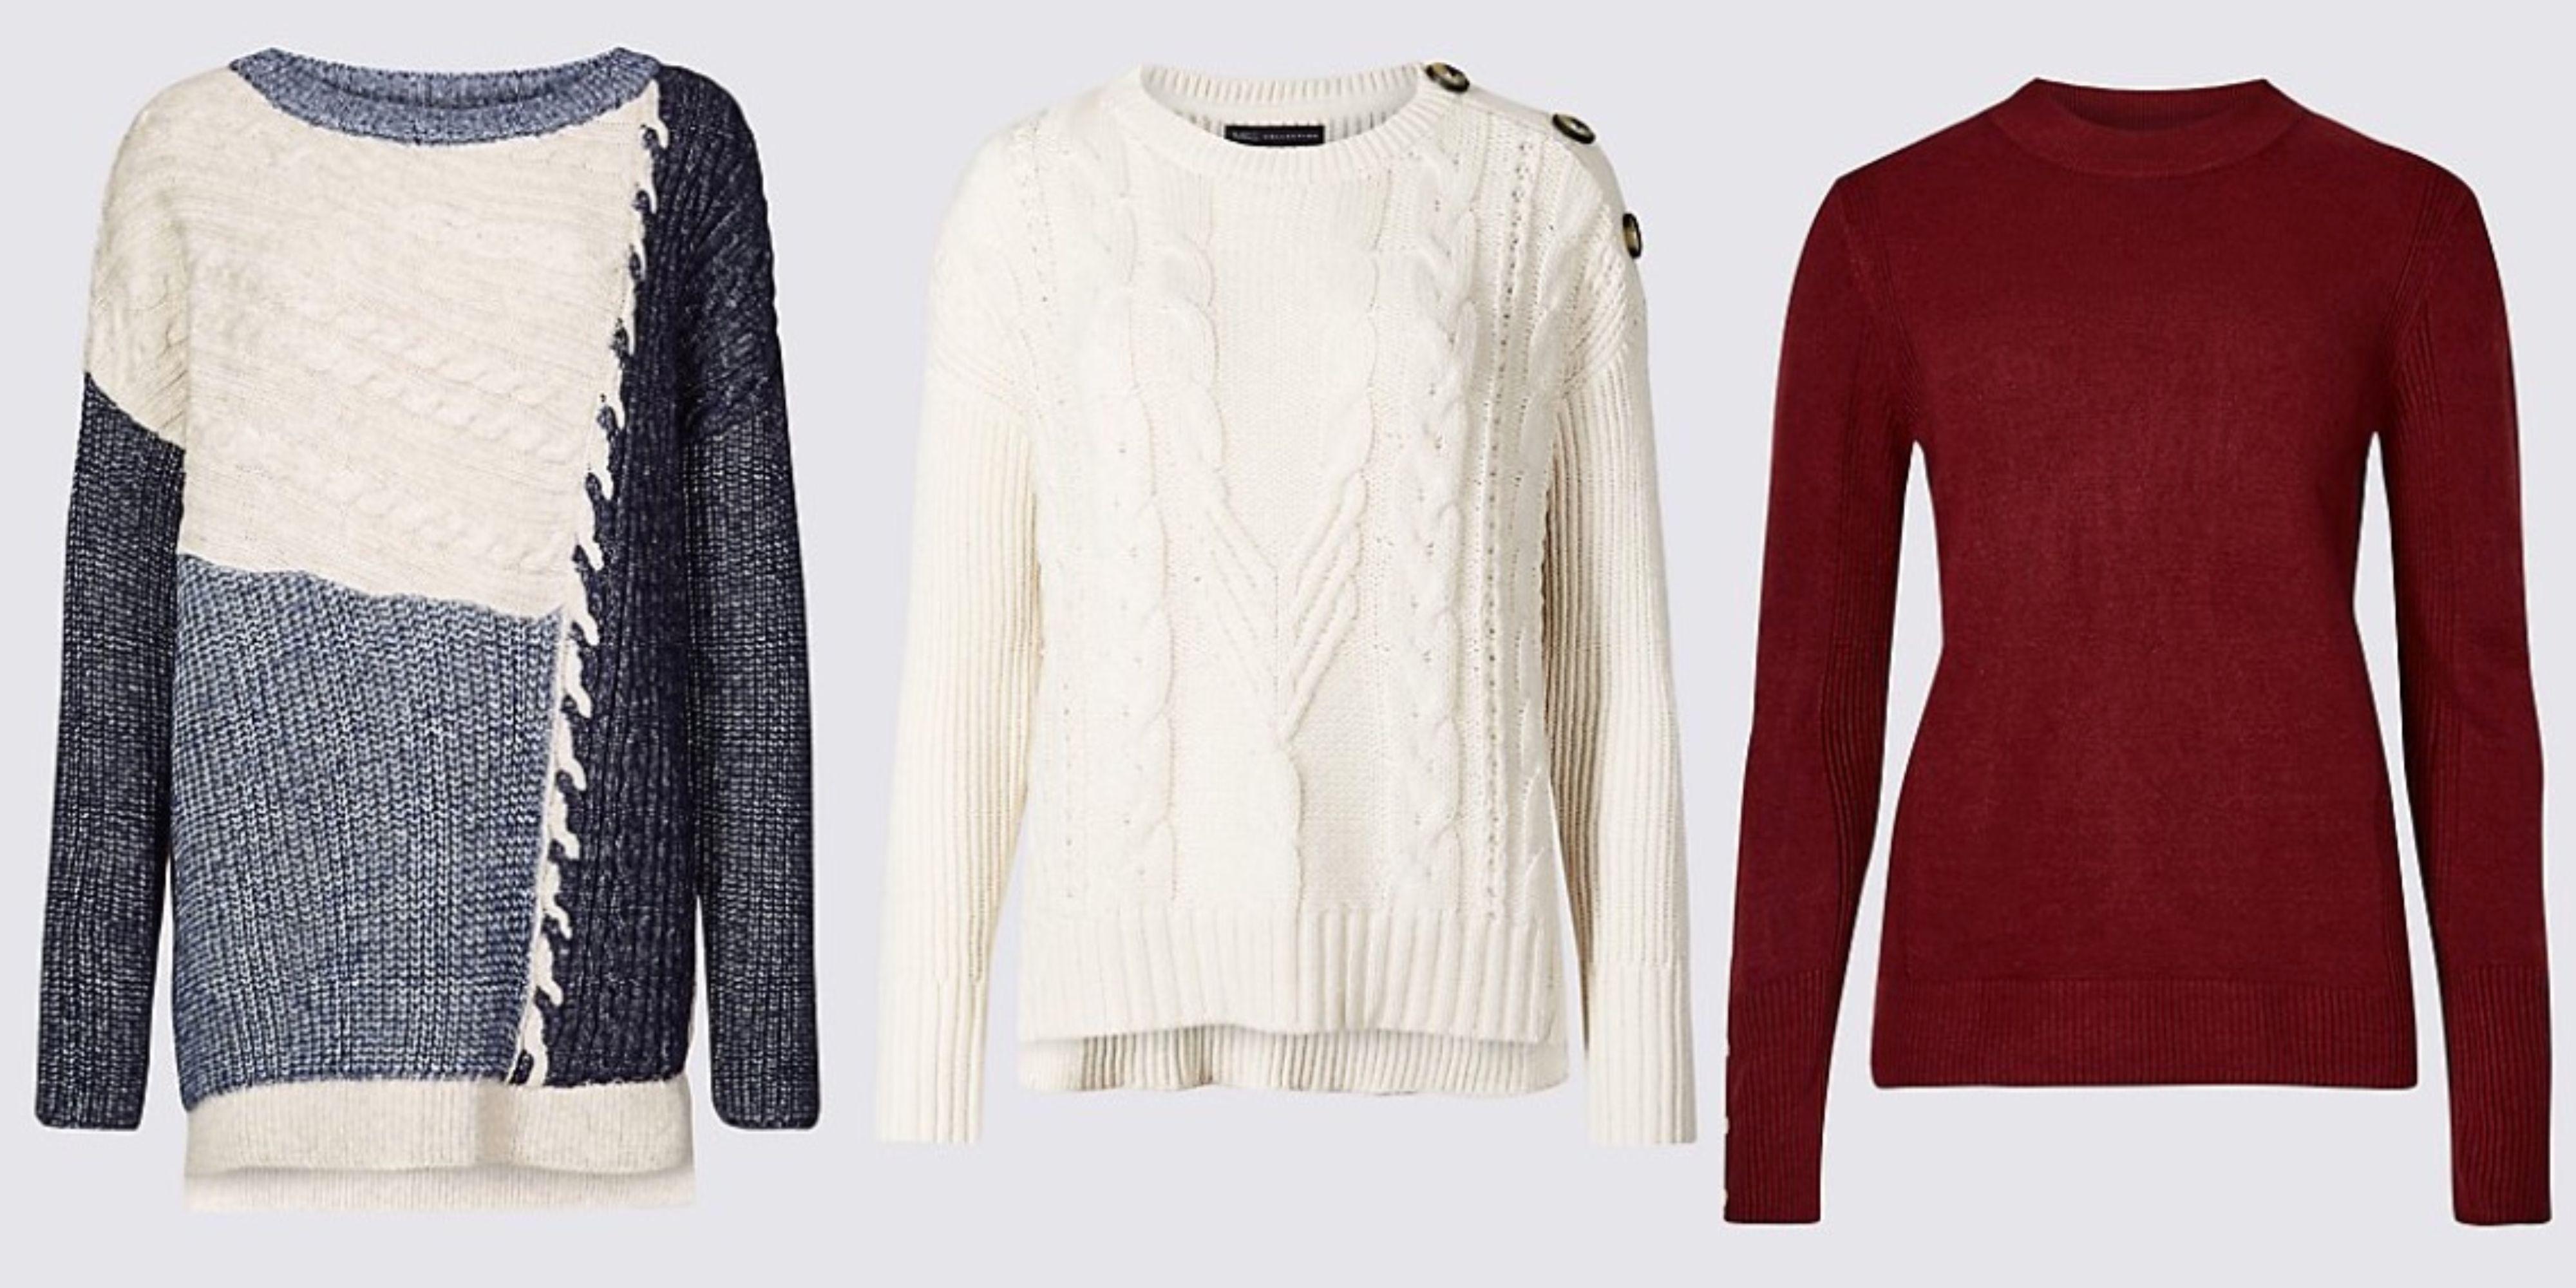 Marks /& Spencer Womens Button Through Cardigan Super Soft Round Neck Top Jumper